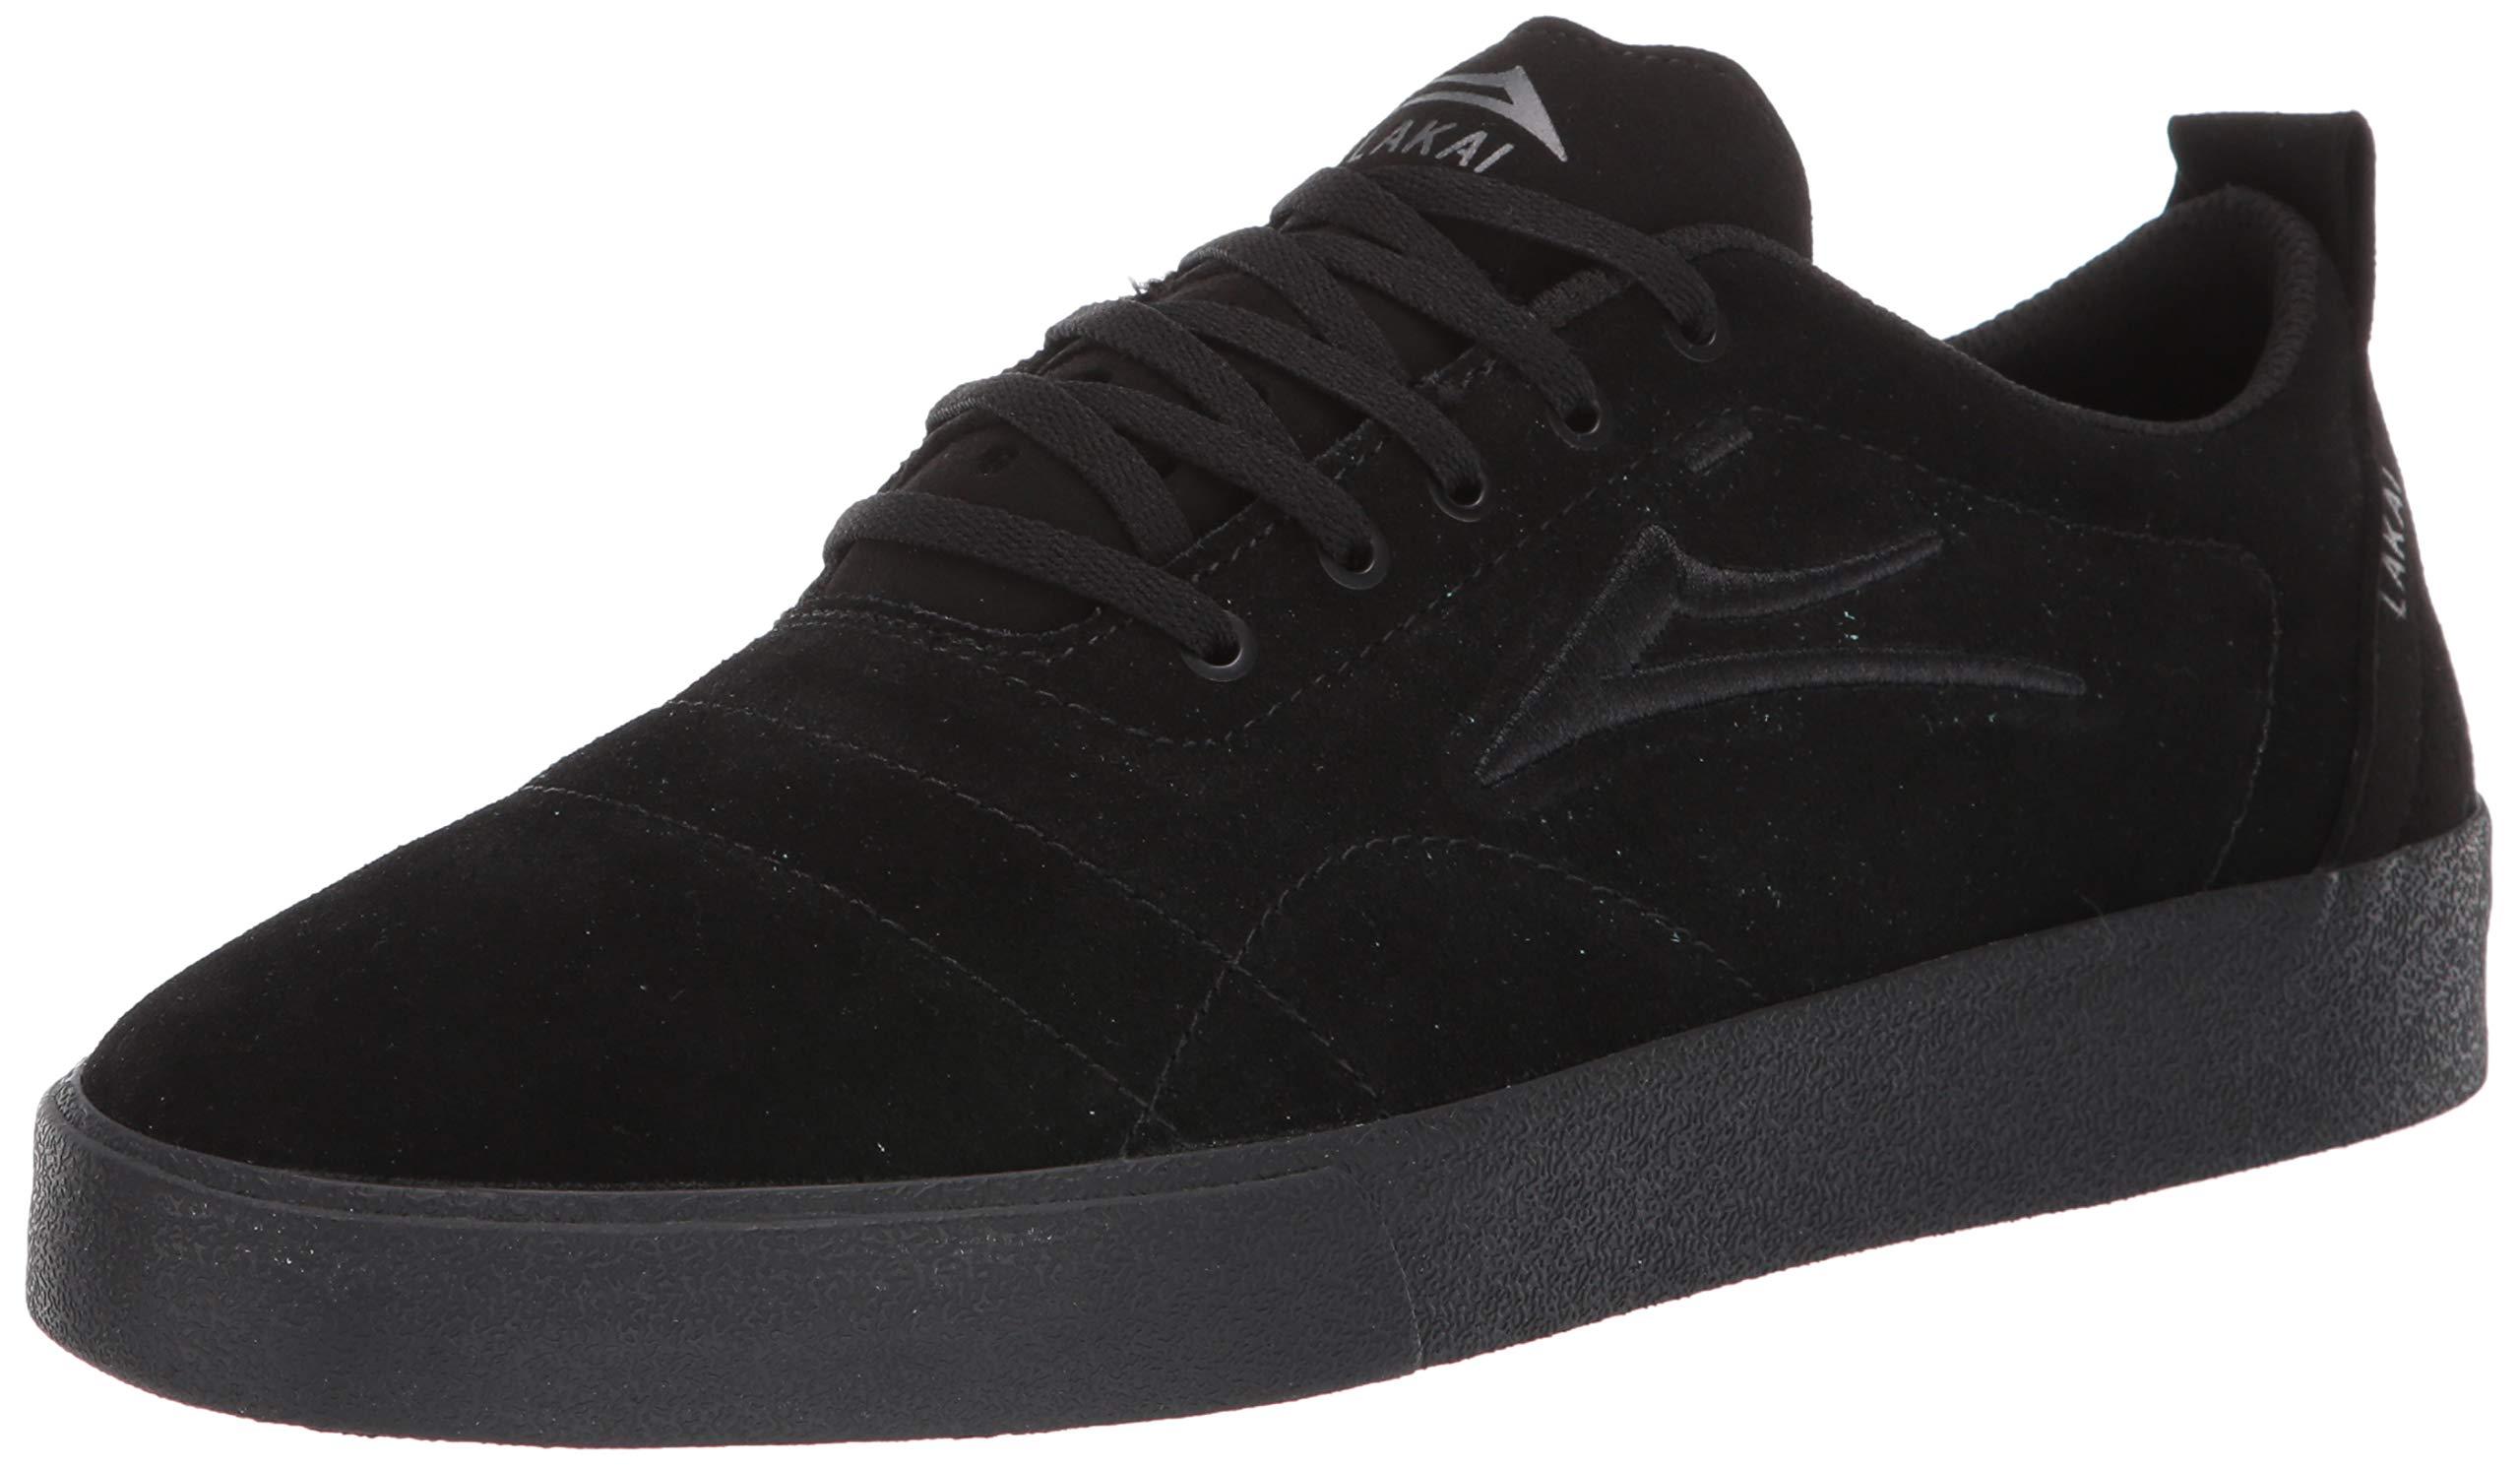 Lakai Limited Footwear Mens Bristol Skate Shoe, Black Suede, 10.5 M US by Lakai Limited Footwear Mens